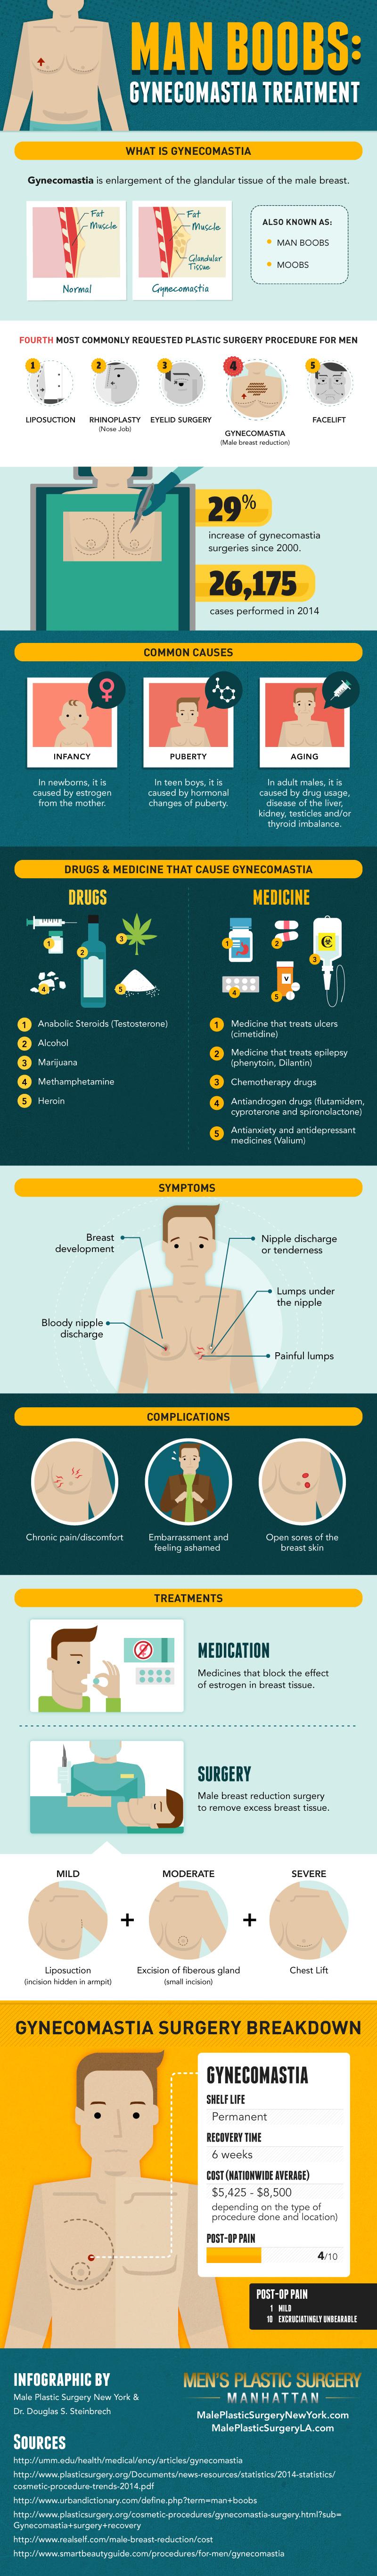 gynecomastia-man-boobs-infographic